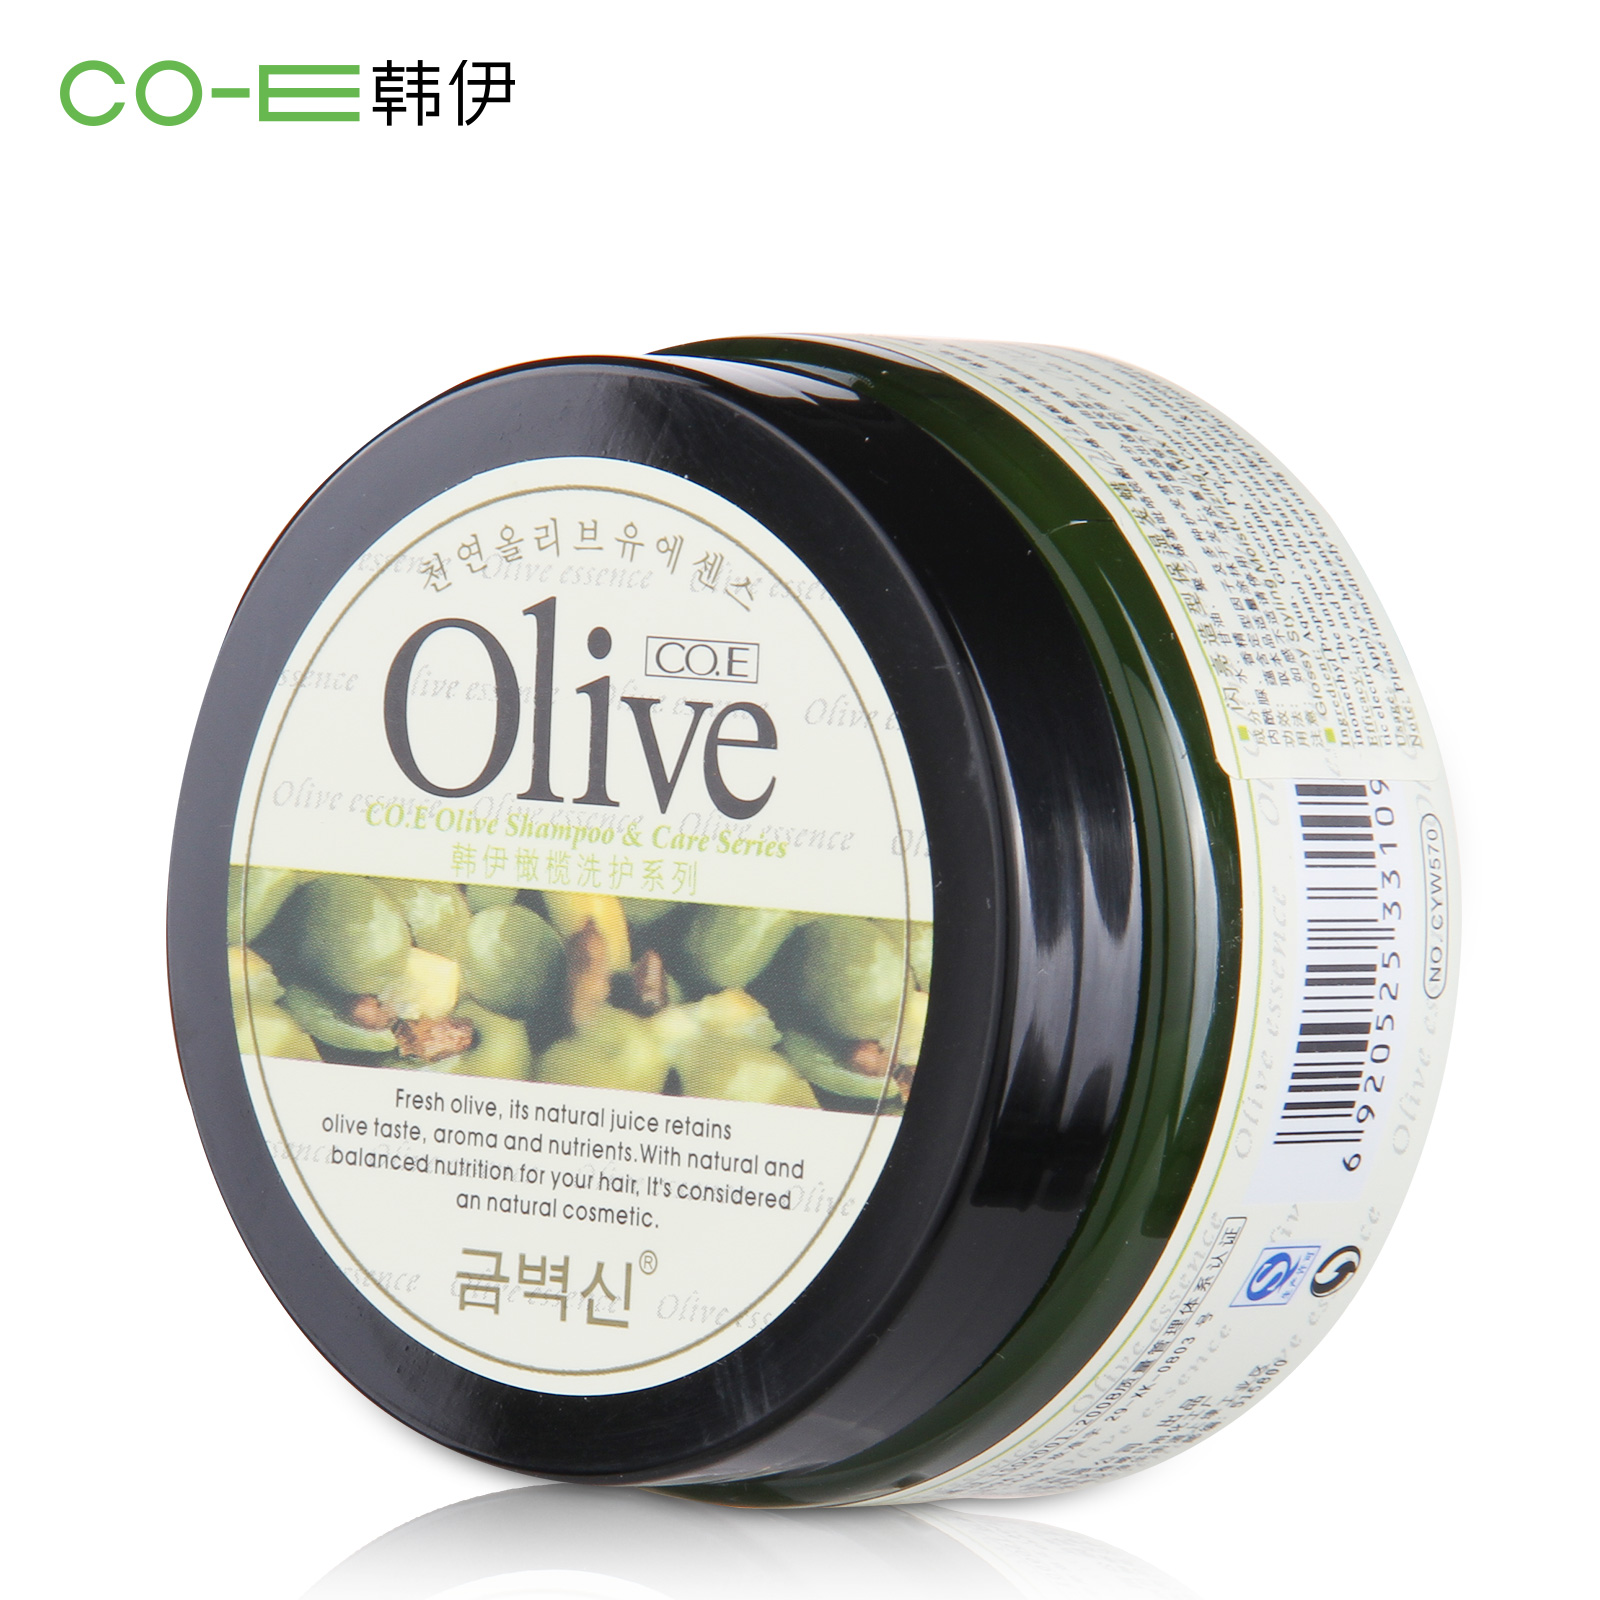 Аксессуары для укладки волос Co. e  CO.E -Olive 100g аксессуары для укладки волос co e co e olive 100g